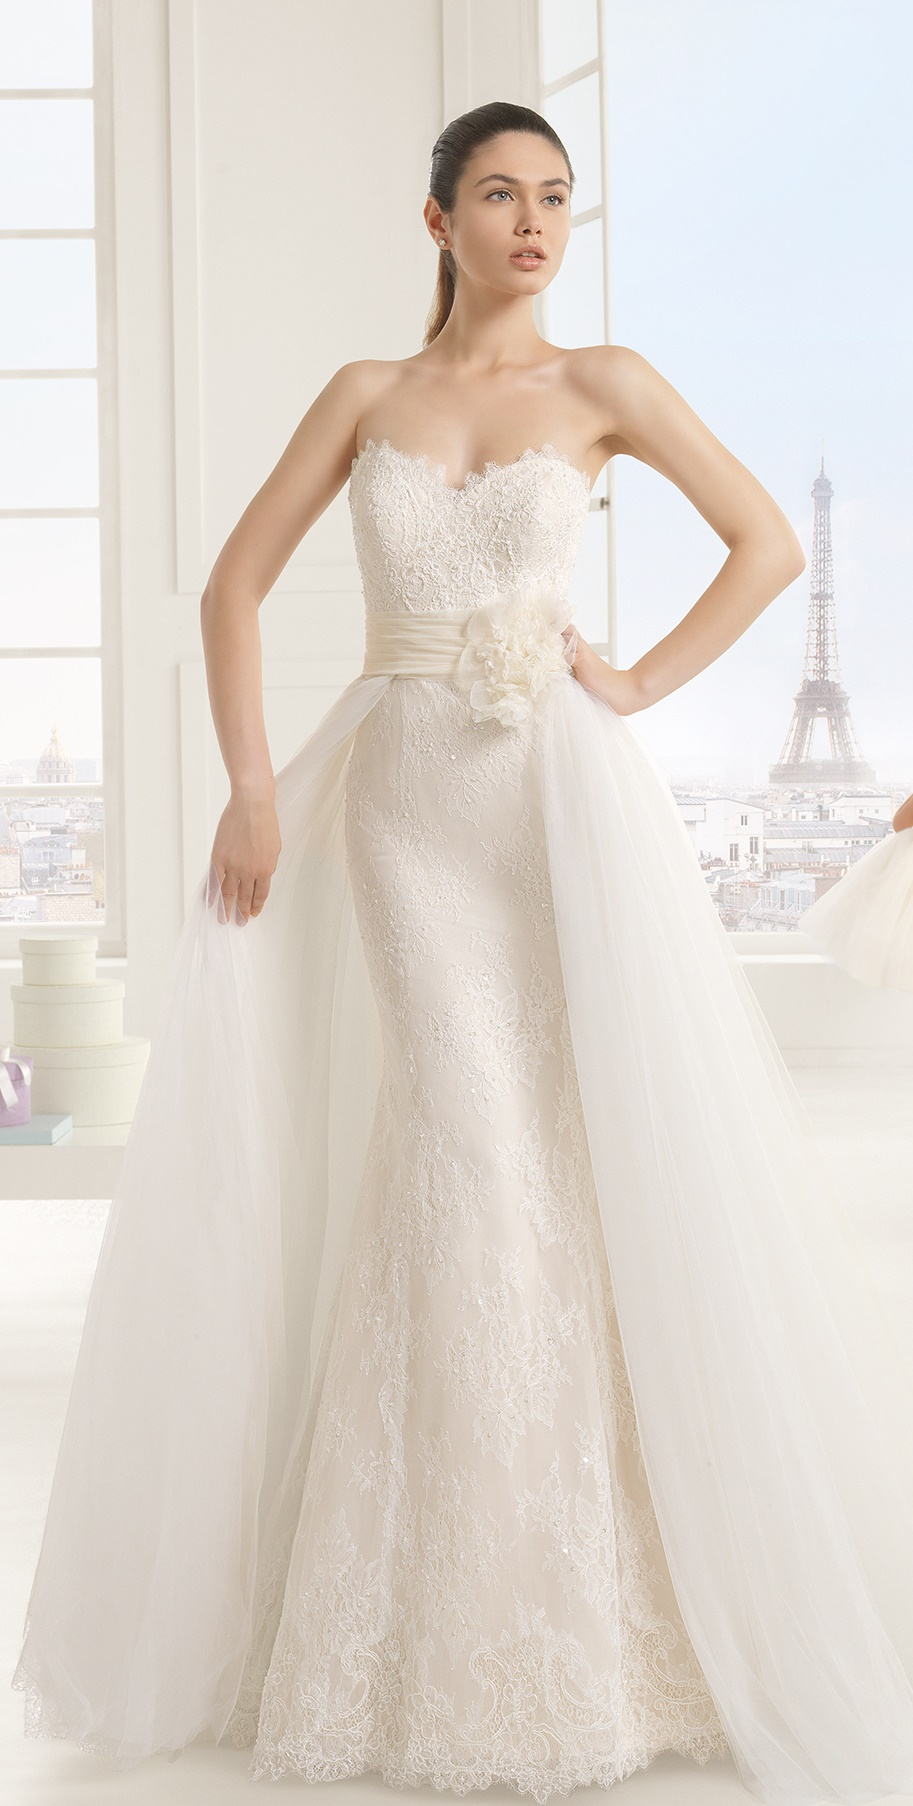 Rosa Clará15 - Vestidos de Noiva - Bridal Collection 2016